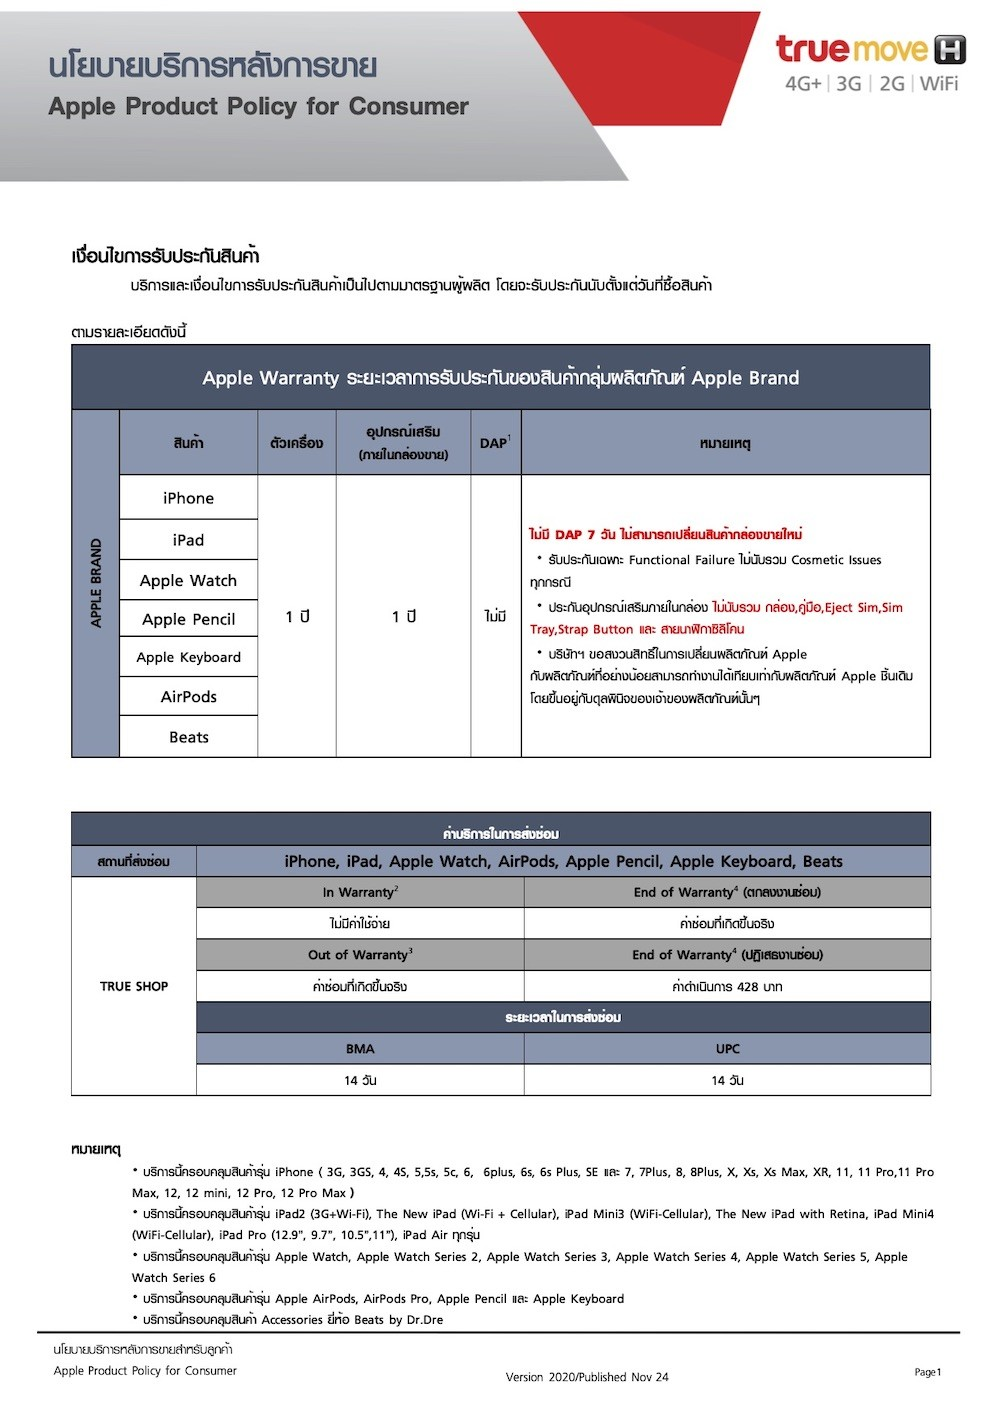 1-dafs_policy_consumer_apple_nov242020.j